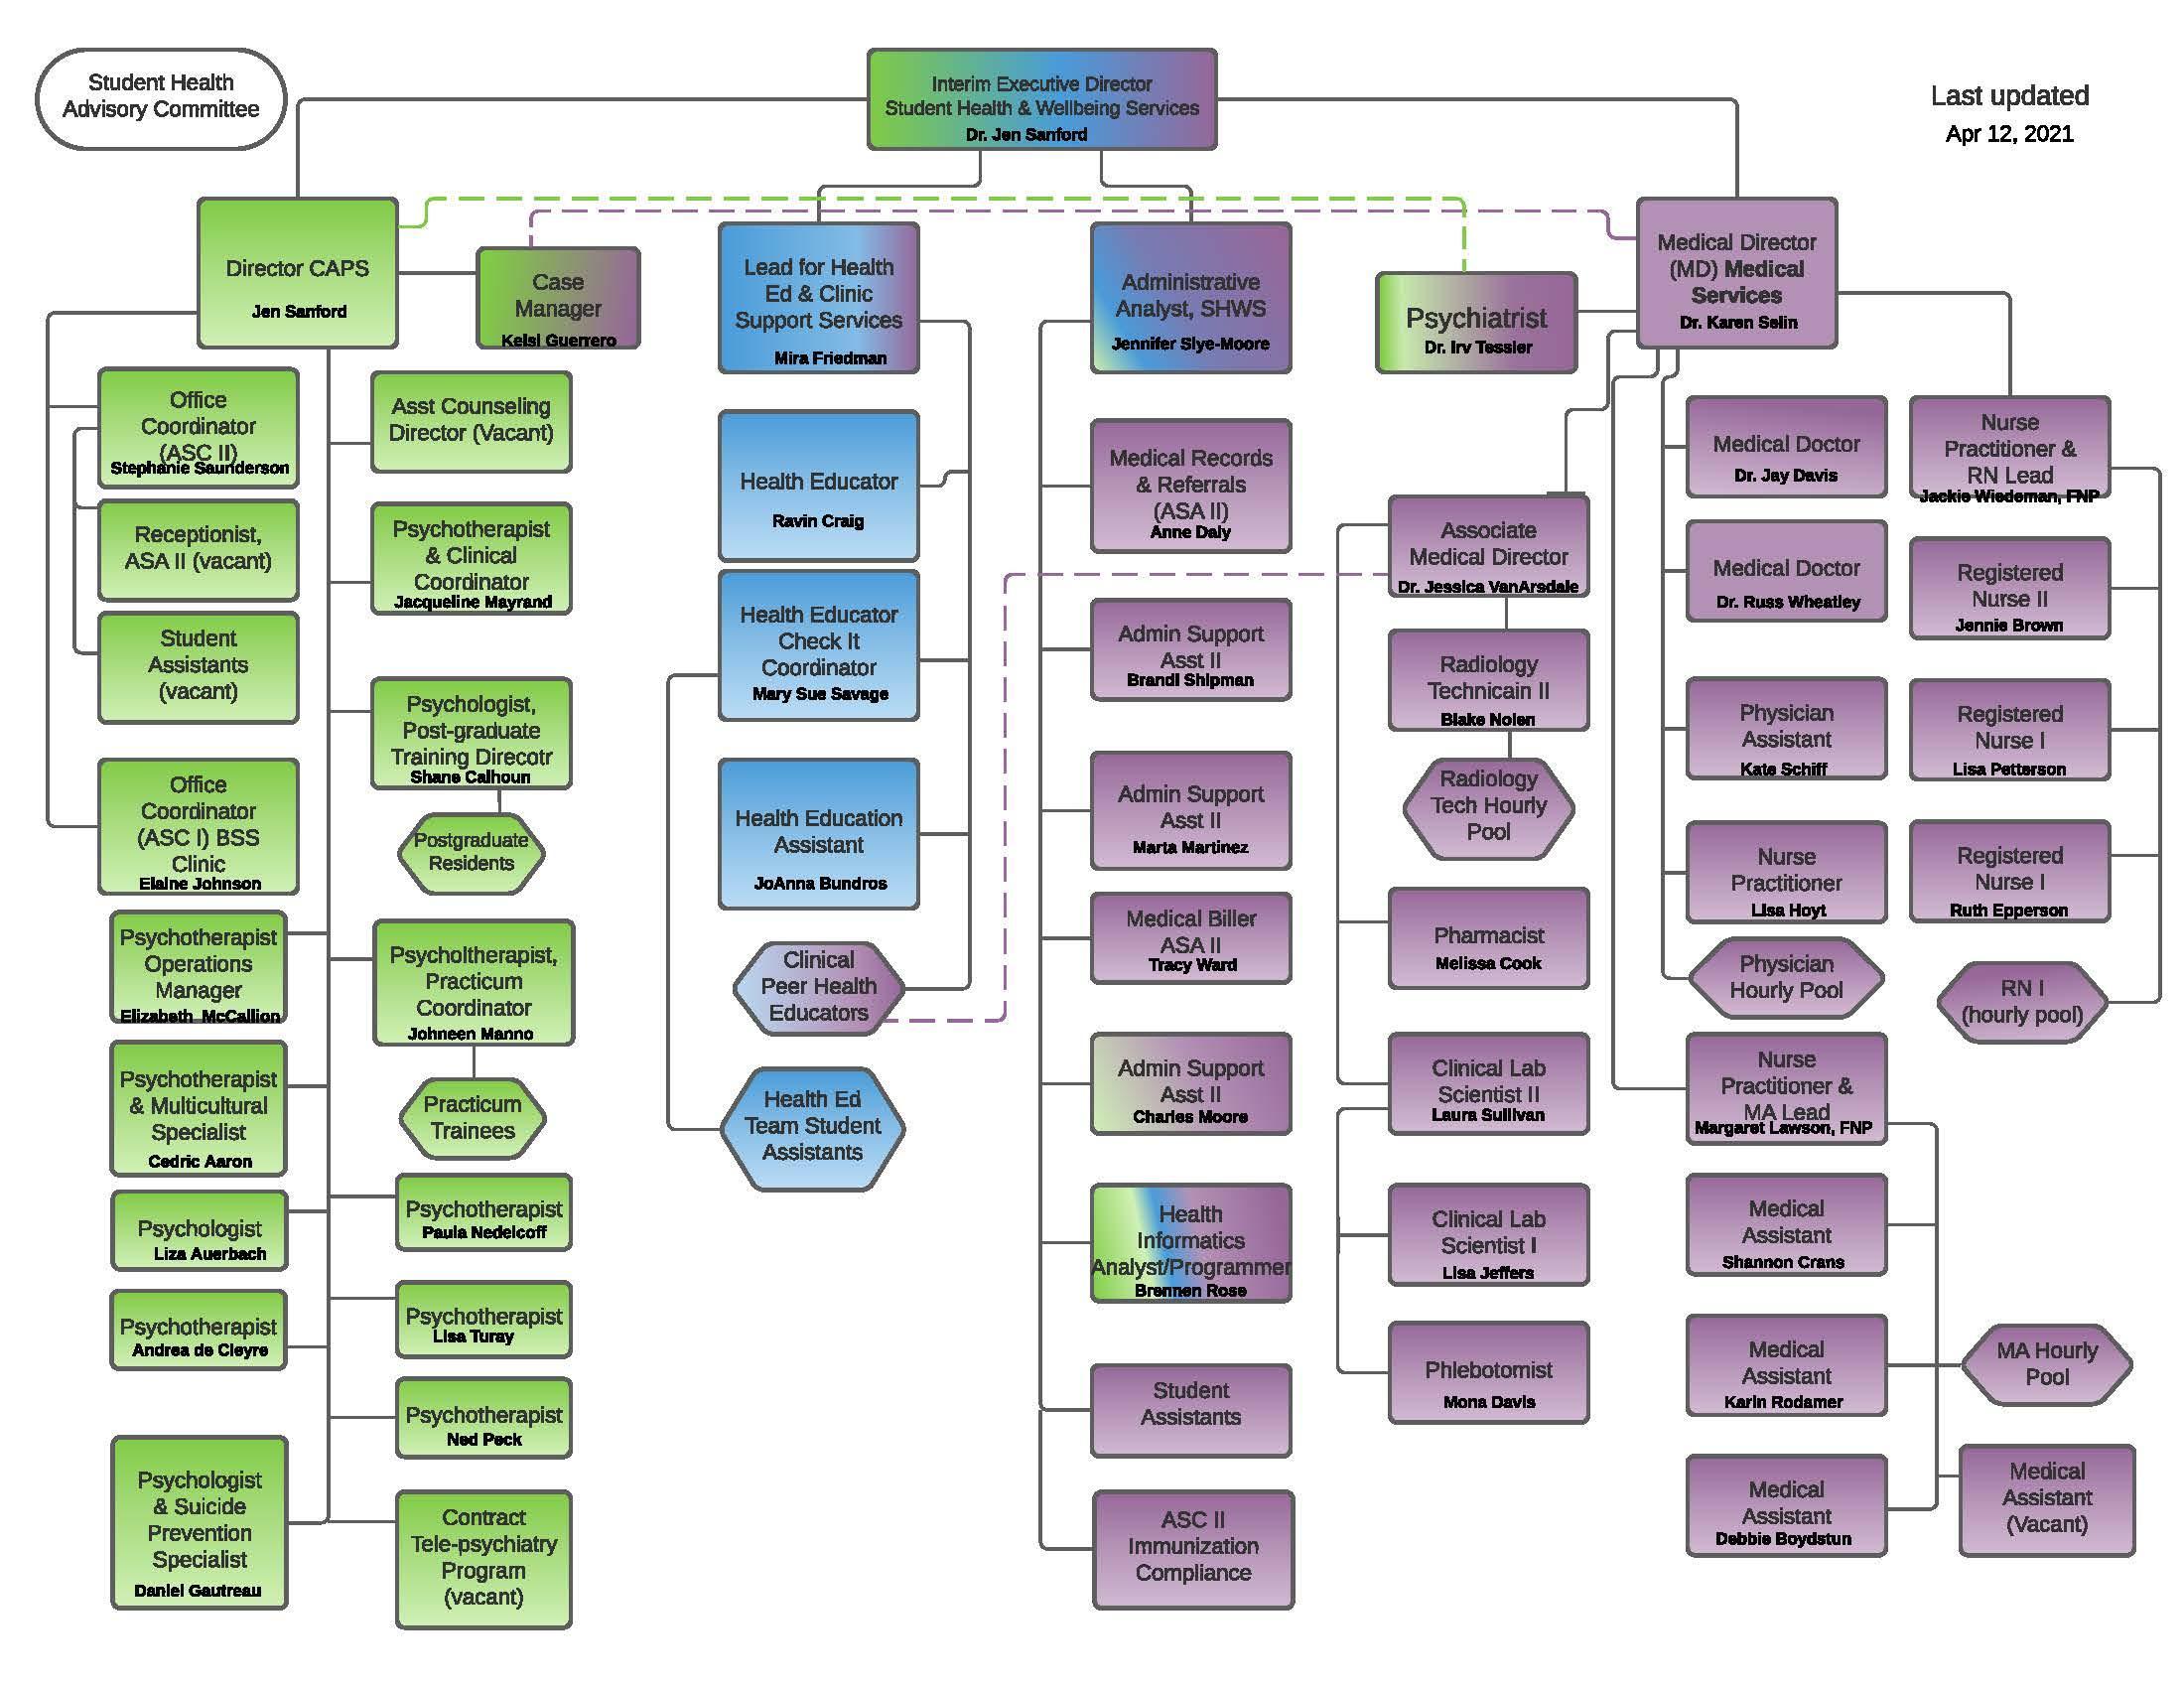 Organizational Chart for SHWS